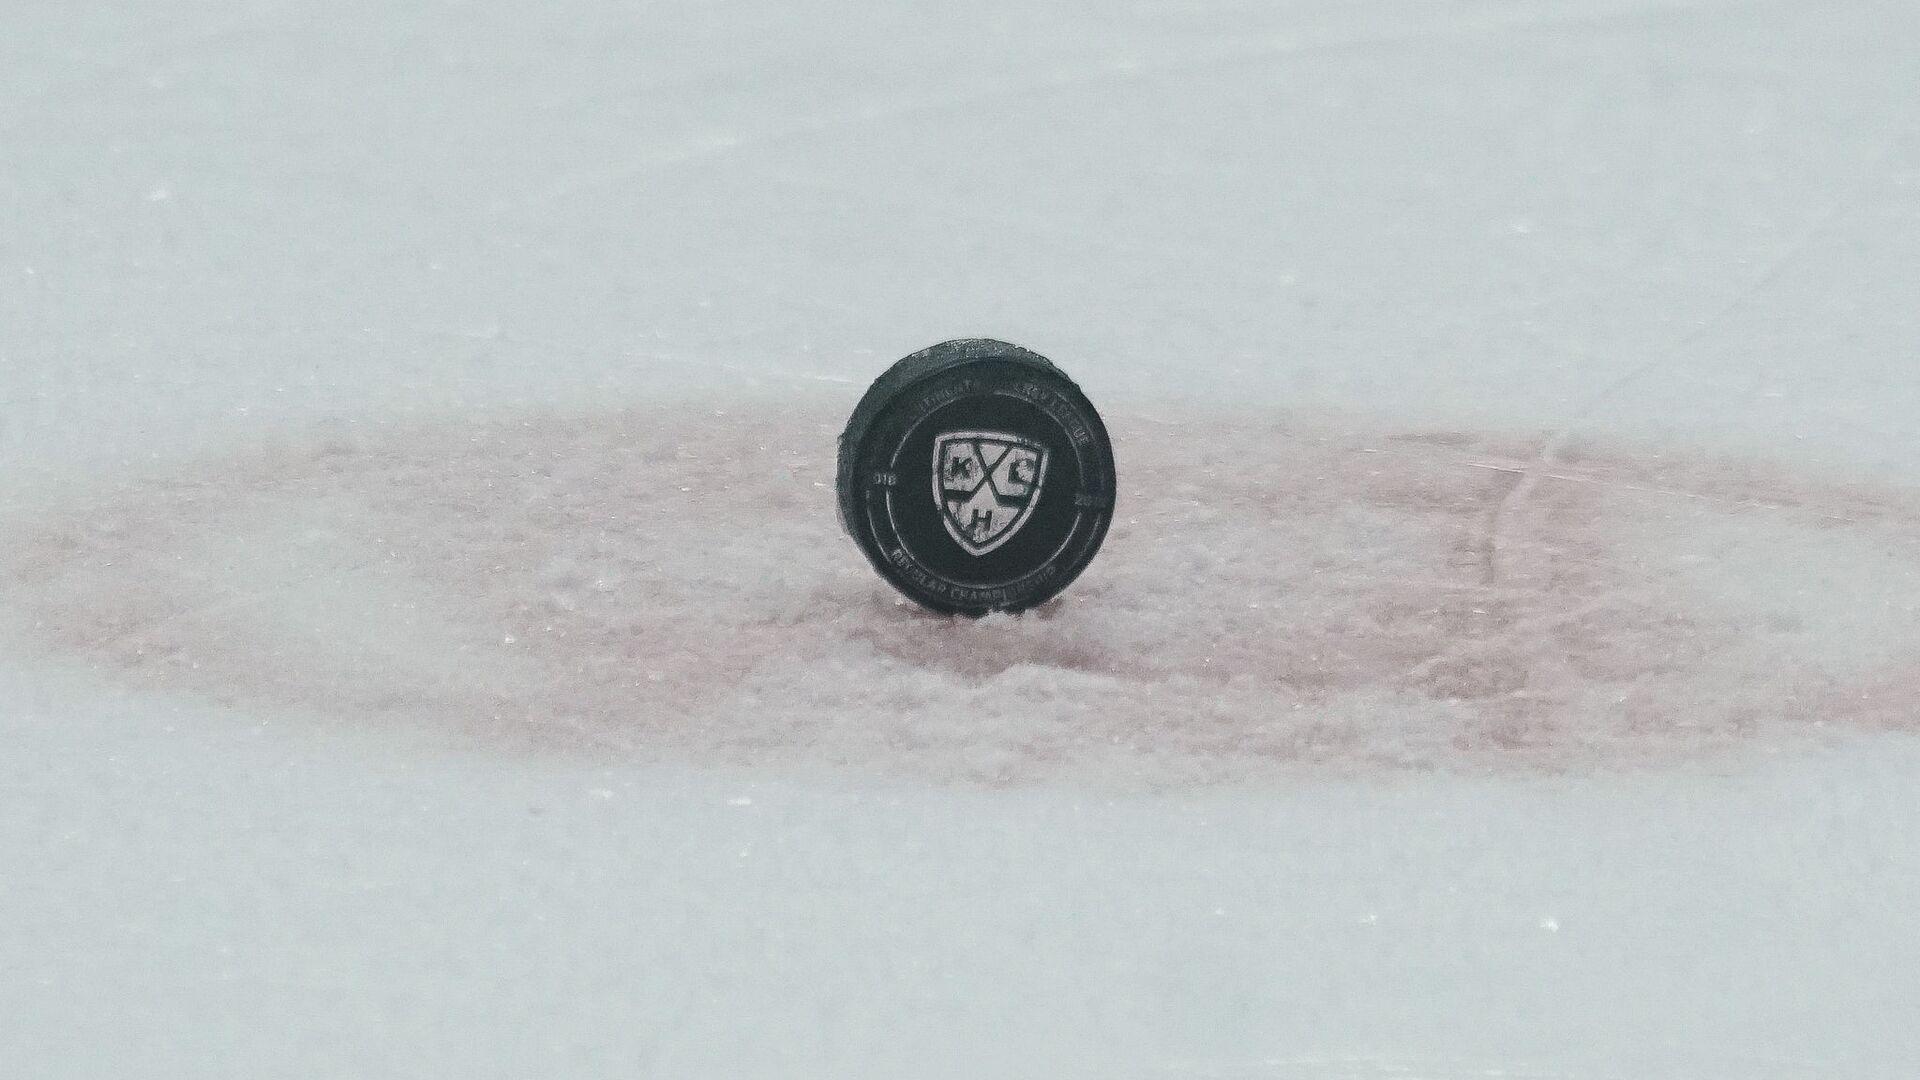 Игра регулярного чемпионата КХЛ Динамо (Рига) - Ак Барс - Sputnik Латвия, 1920, 03.09.2021